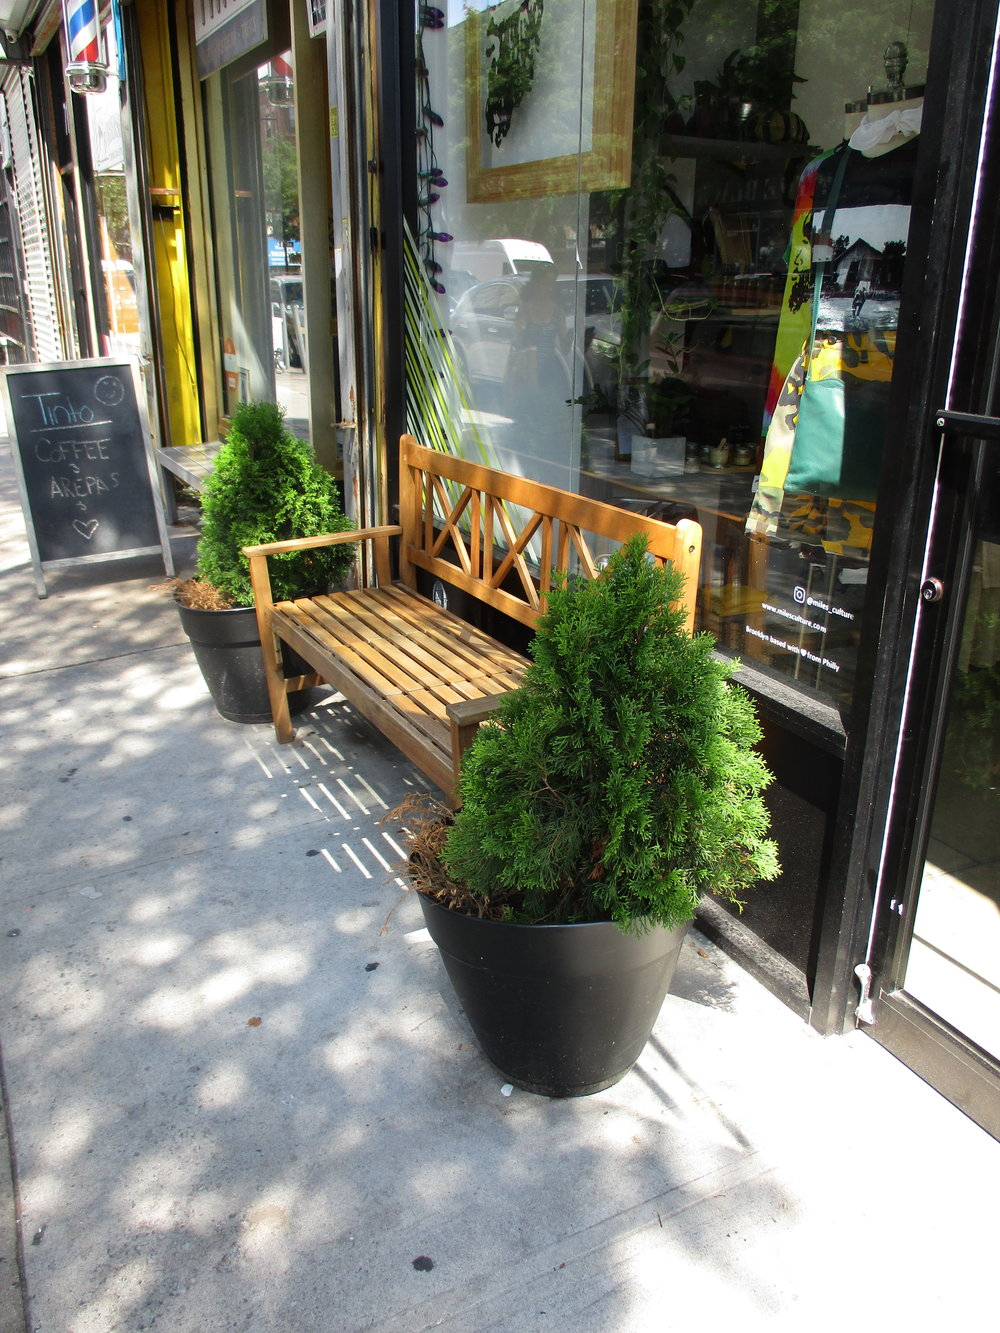 Miles Culture - Nostrand Avenue